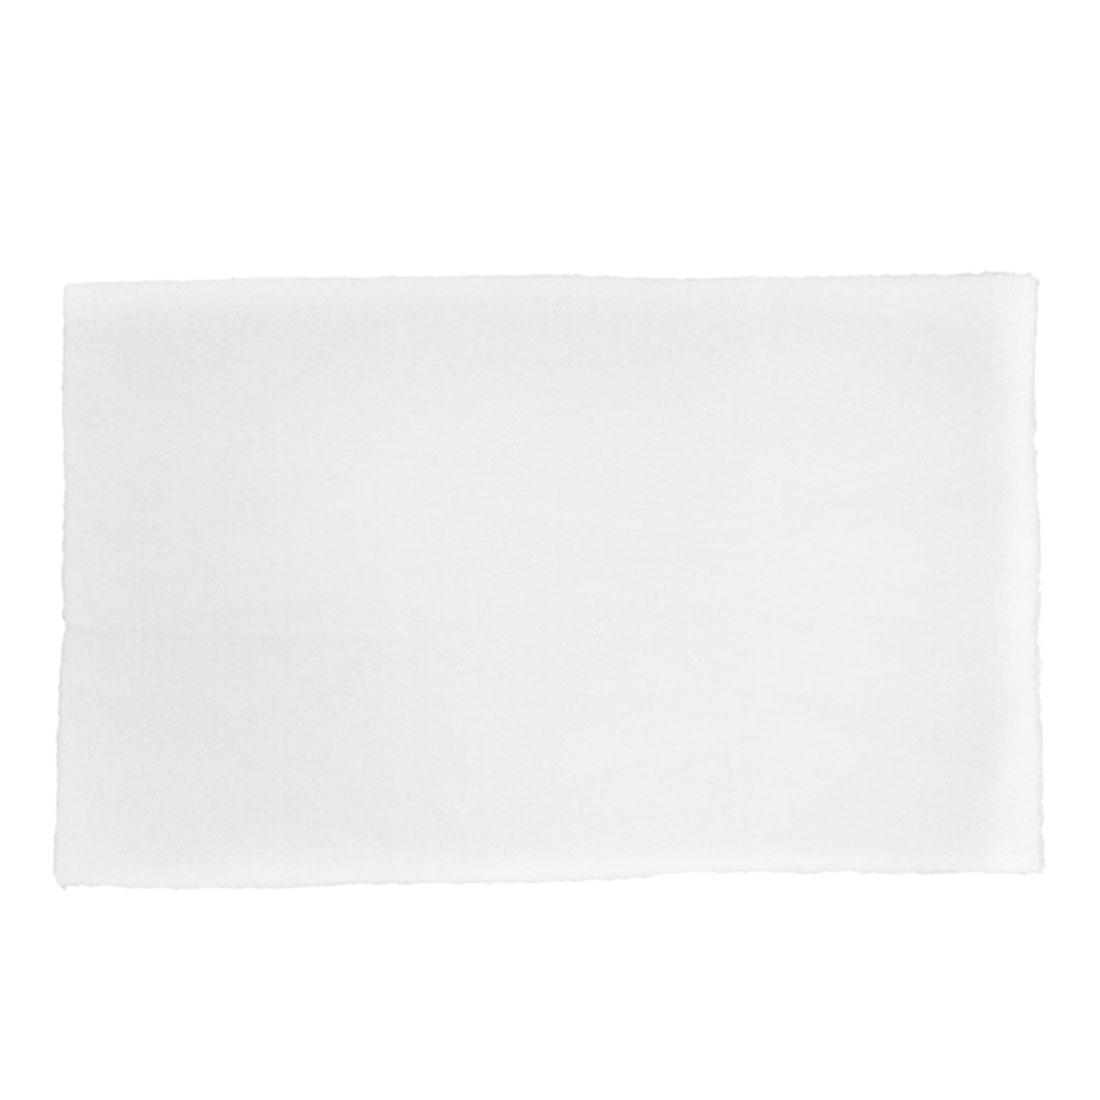 "Aquarium Fish Tank Biochemical Filter Foam Cotton Sponge Pad Mat White 24"" Long"